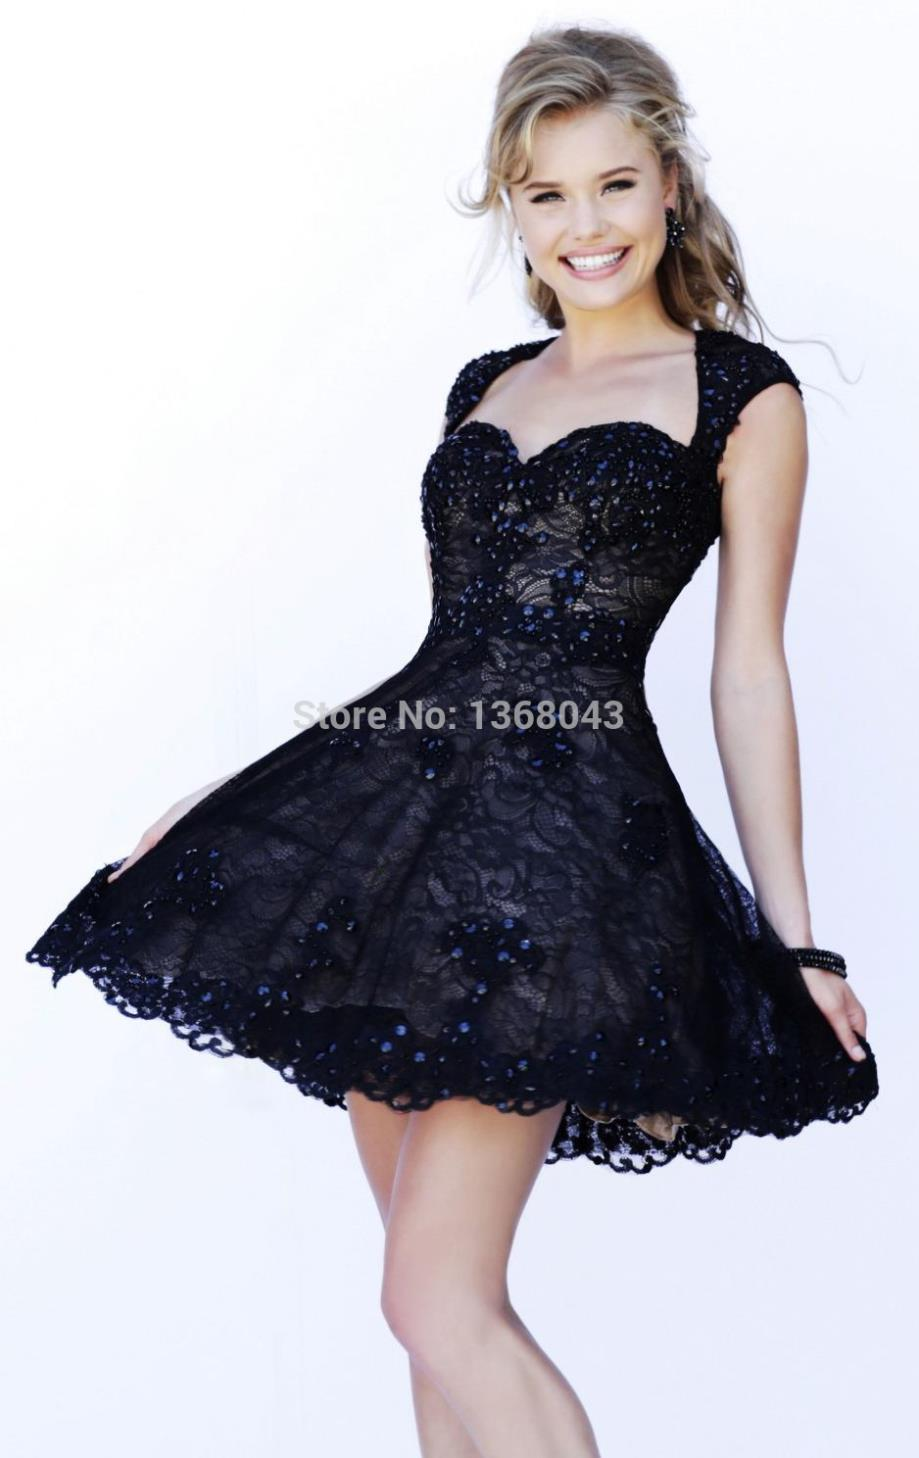 Short White Wedding Dress Black Lace : Beautiful white black sweetheart short sleeve a line